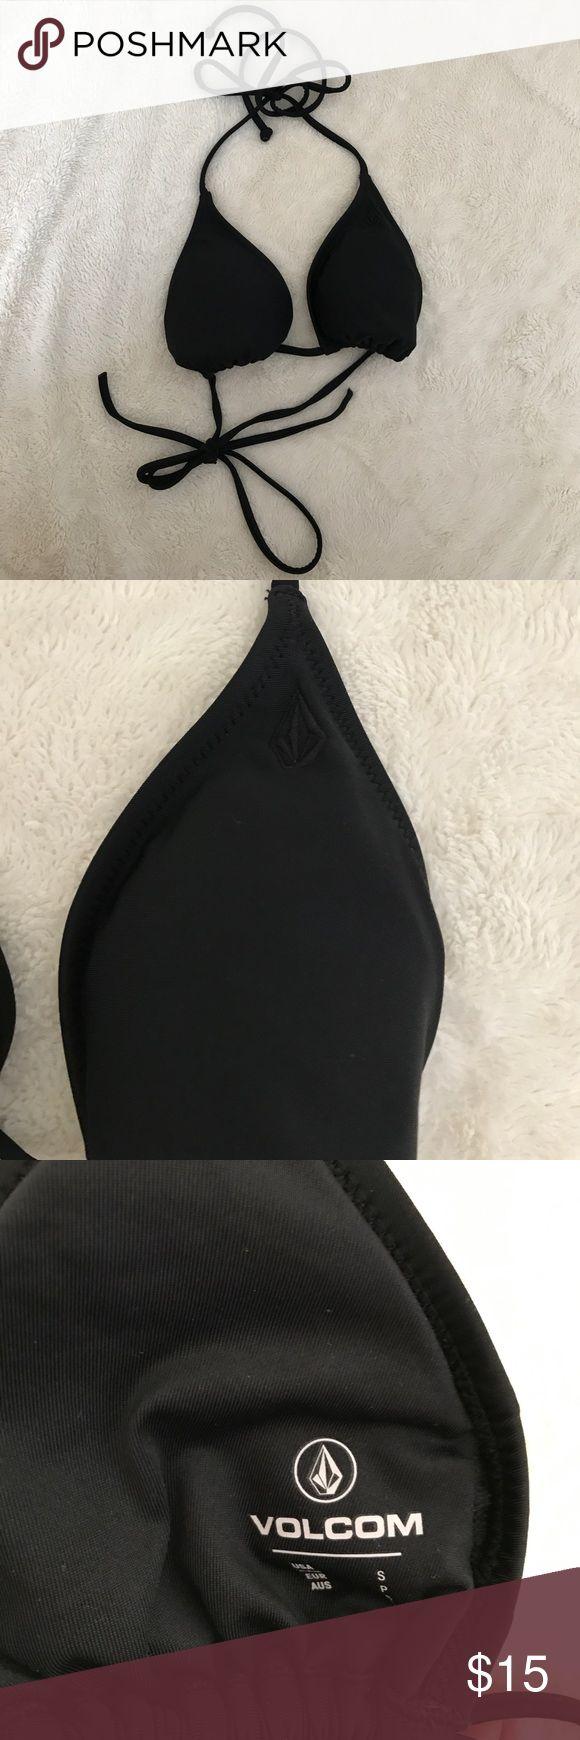 Volcom black triangle bikini top - small Black volcom bikini top in a small. This top is a great basic to pair with any bikini bottom style and color, removable pads included! Volcom Swim Bikinis